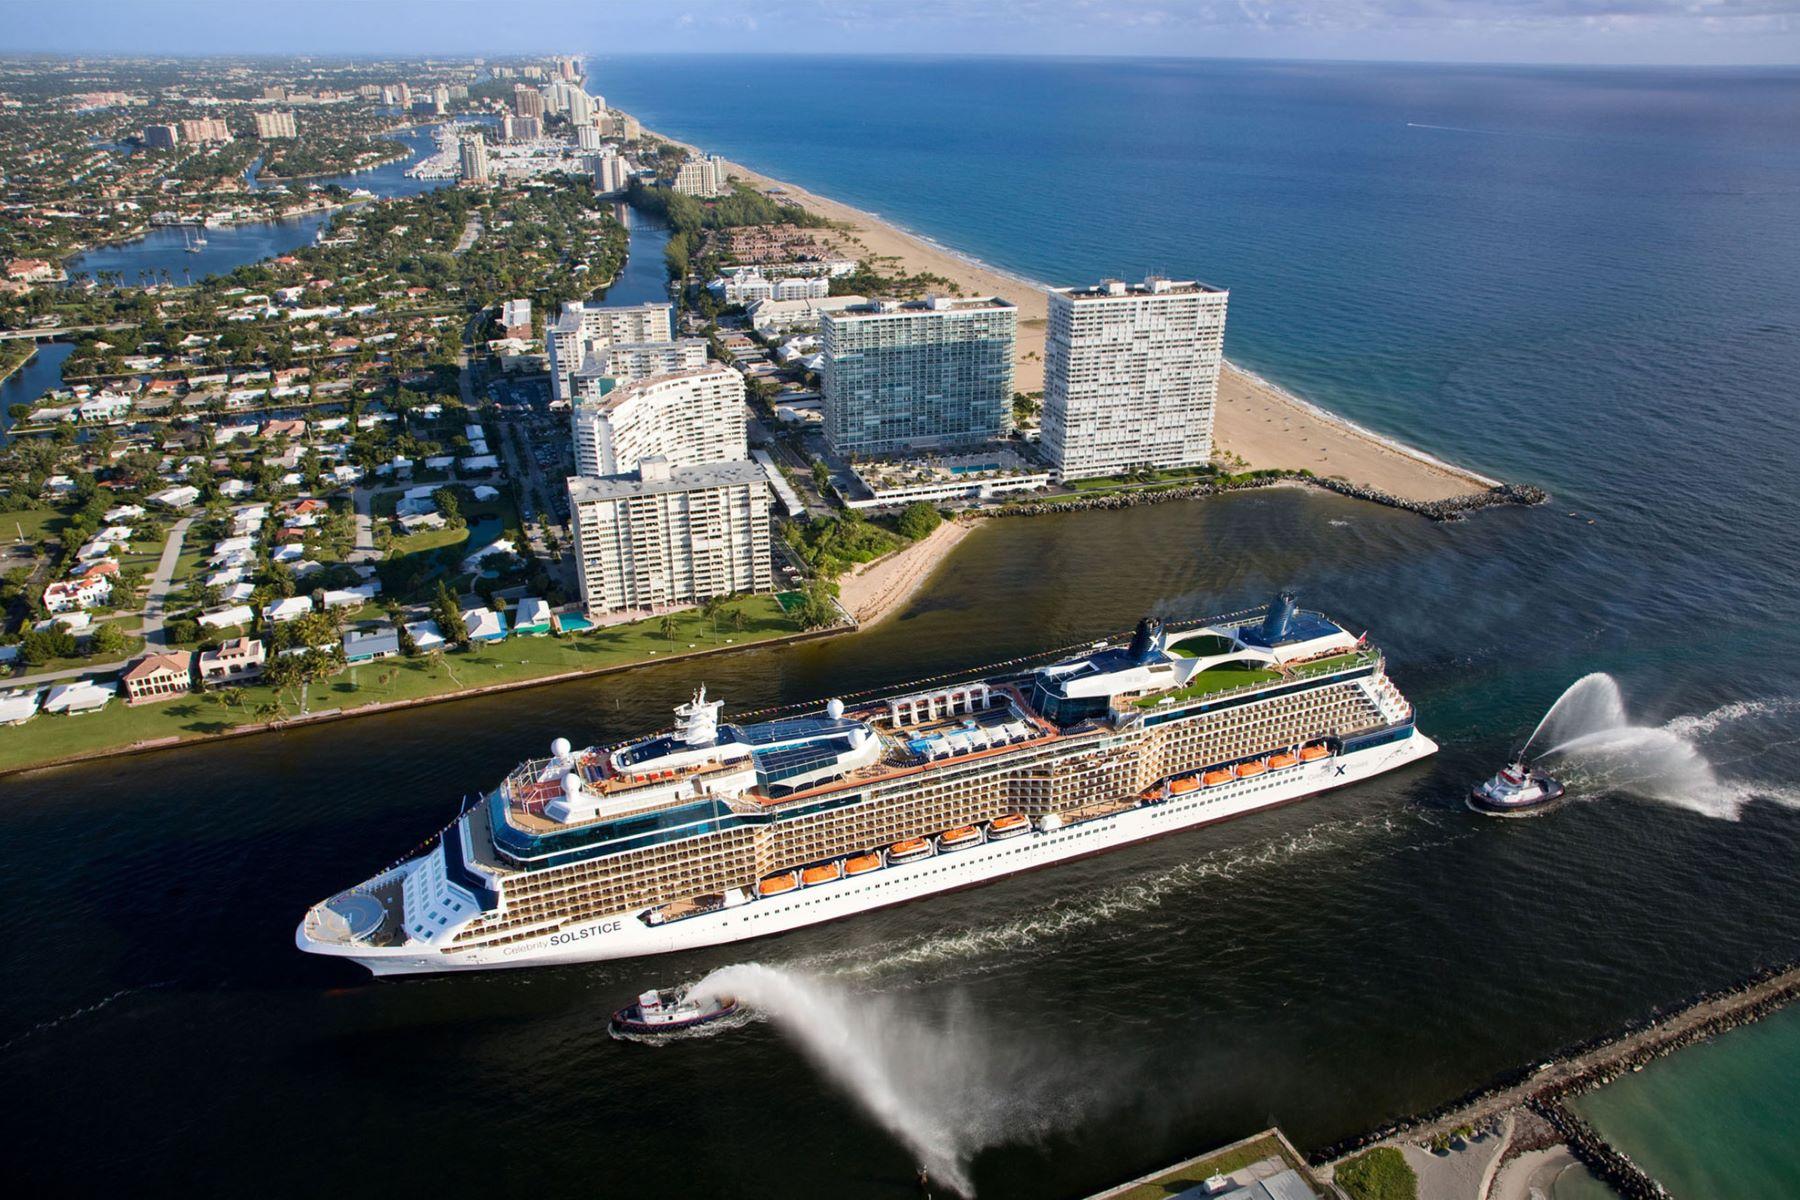 公寓 為 出售 在 2200 S Ocean Ln #2308 2200 S Ocean Ln 2308, Fort Lauderdale, 佛羅里達州, 33316 美國